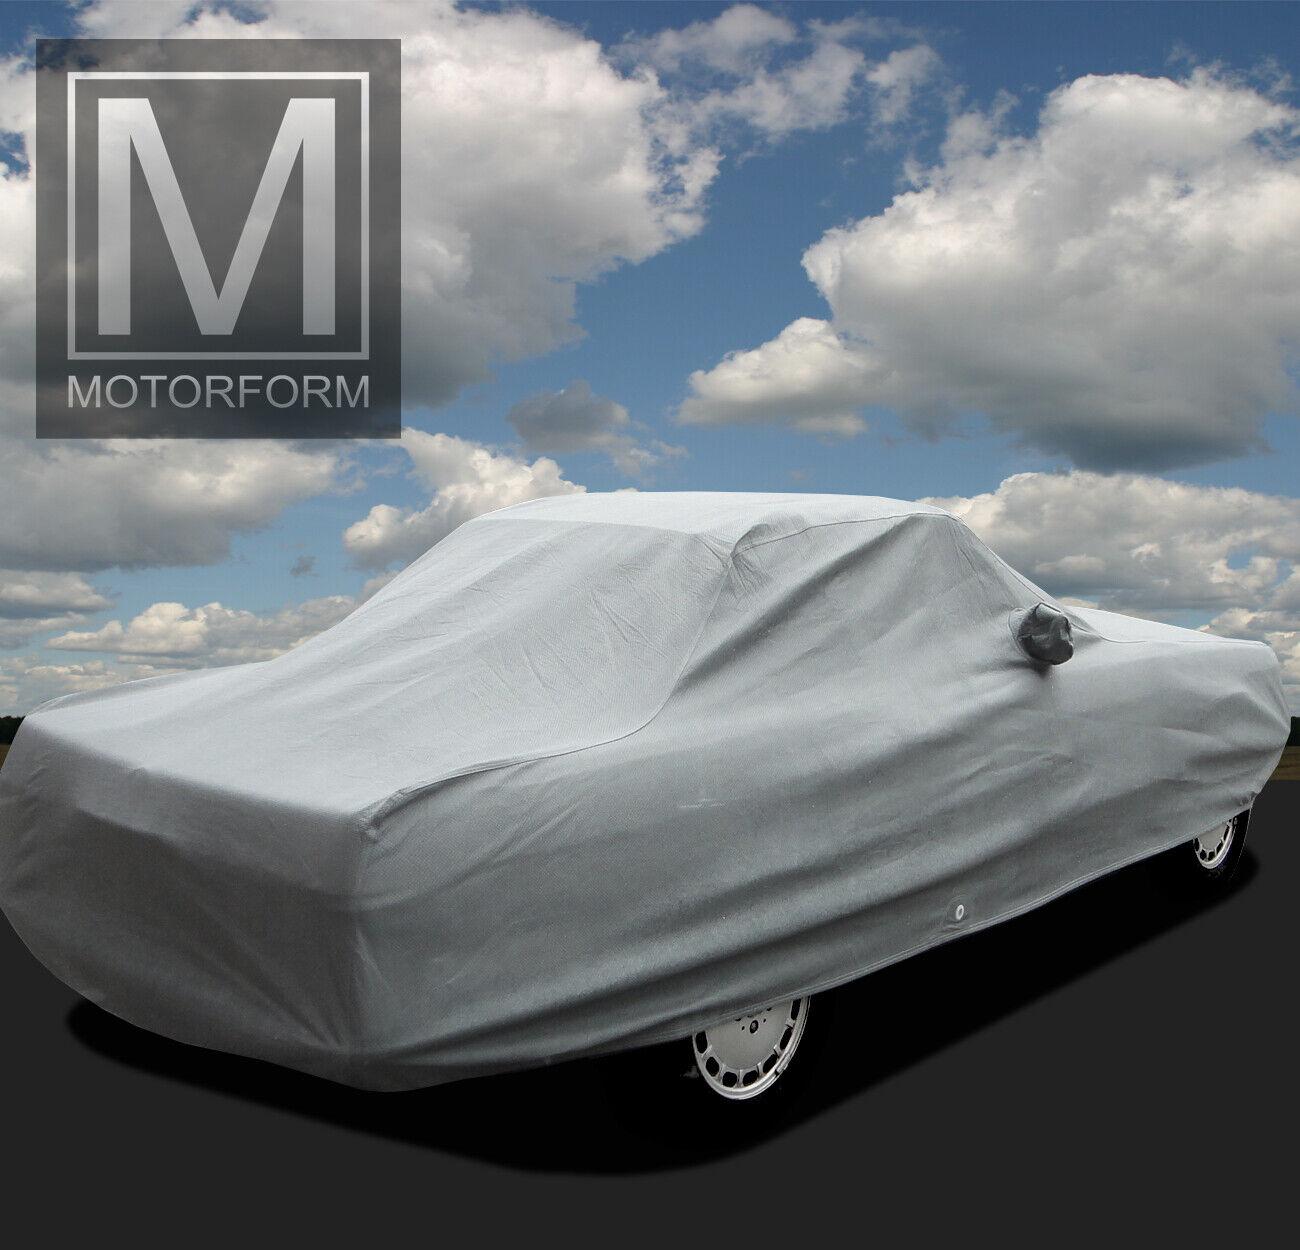 Mercedes W211 Outdoor Schutzdecke Car Cover Ganzgarage Schutzhülle Plane Hülle